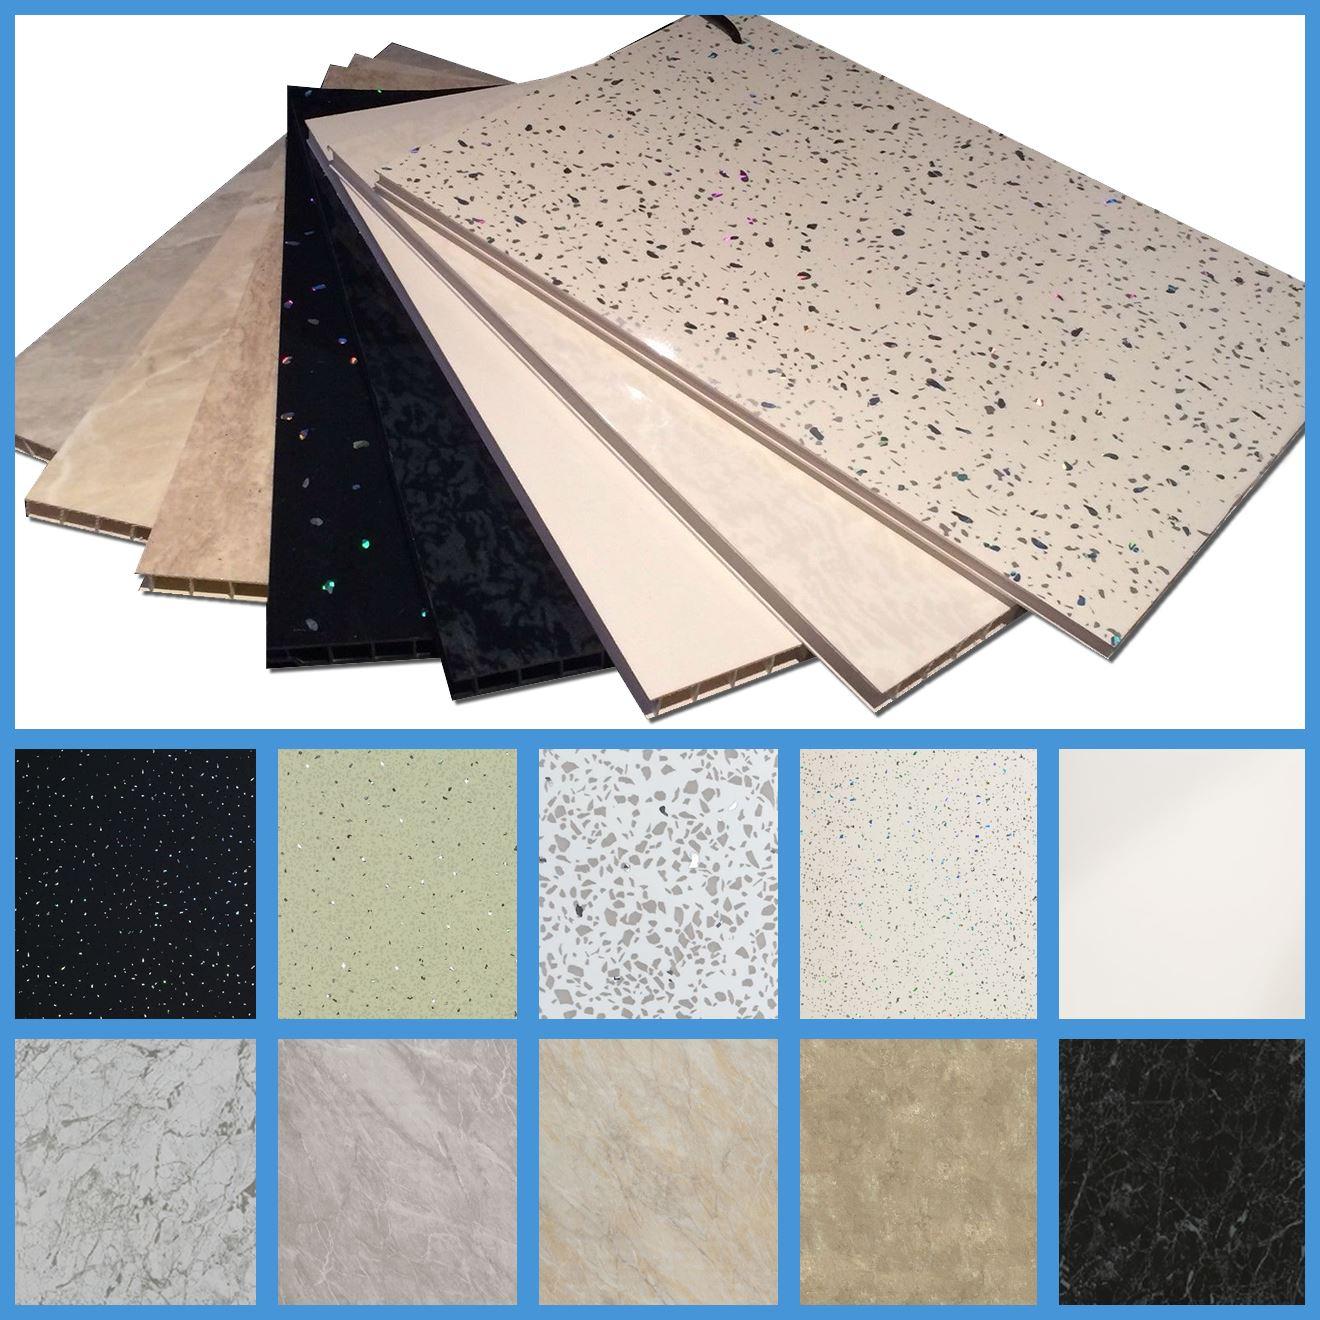 Waterproof Panels For Shower Walls - Cintinel.com